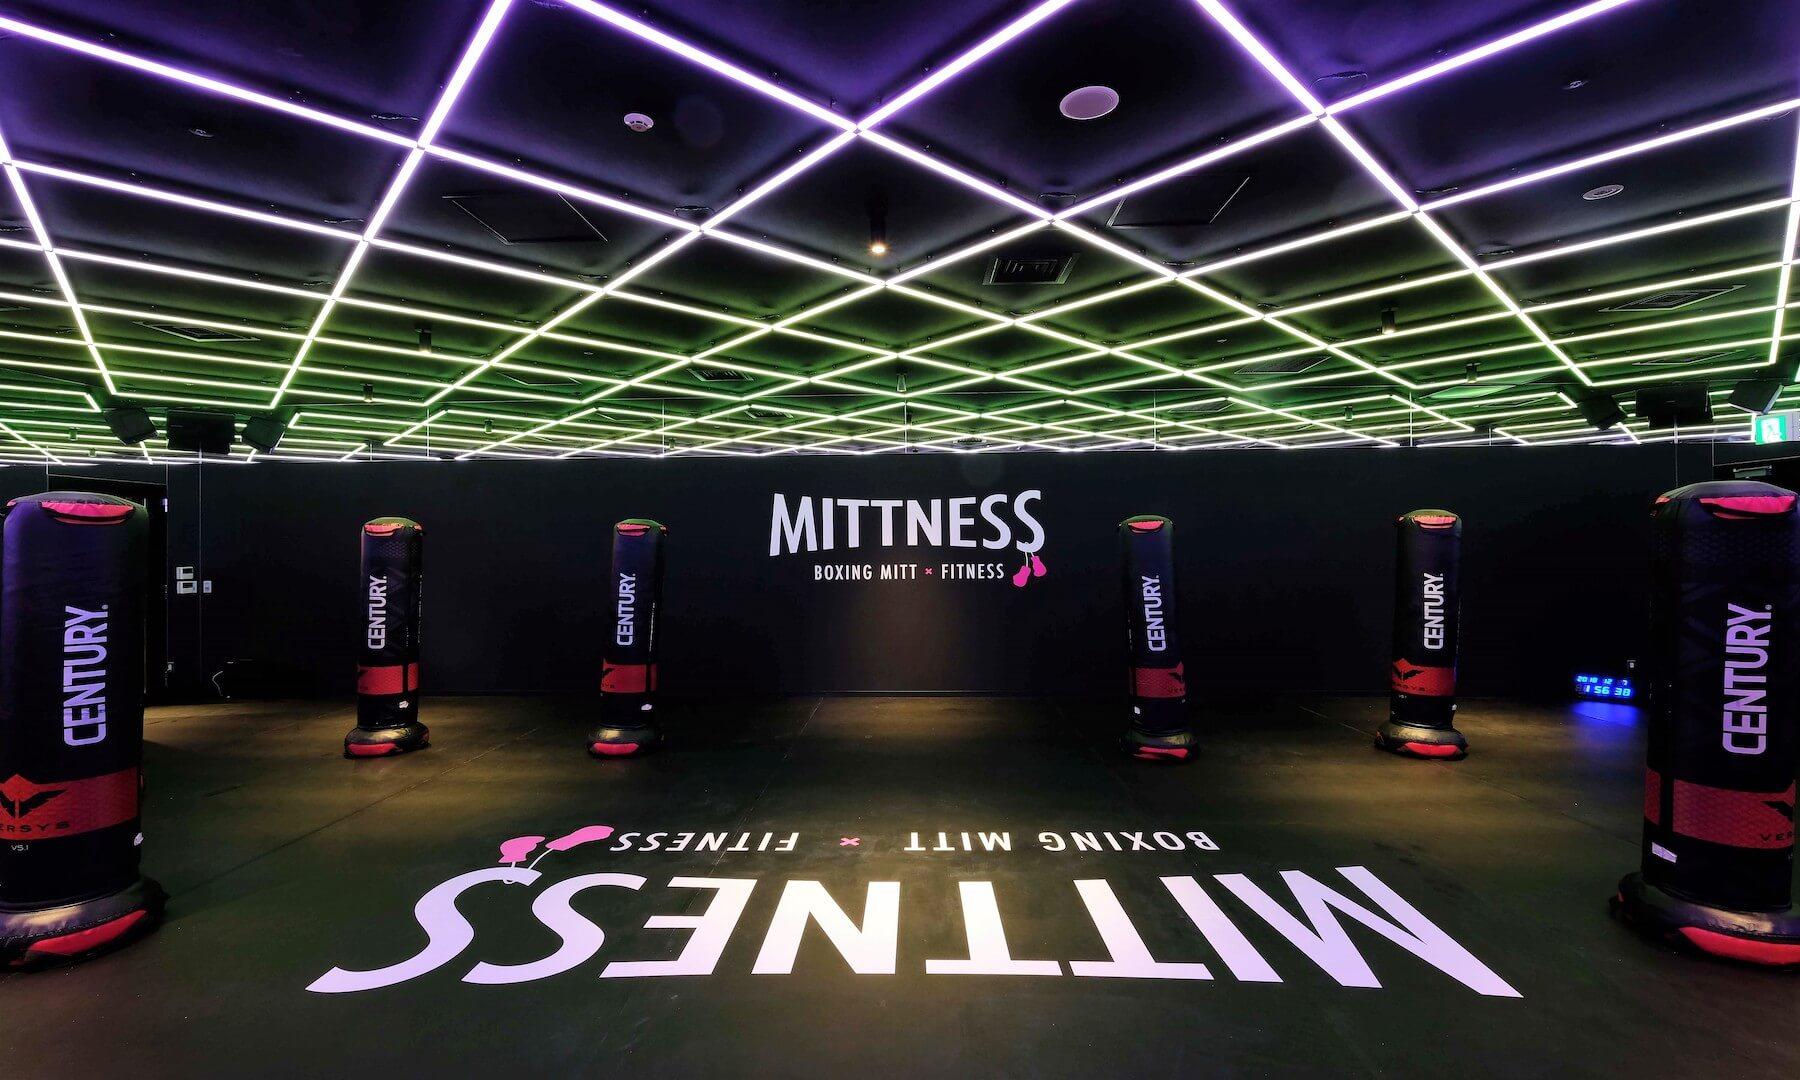 MITTNESS銀座店のイメージ写真